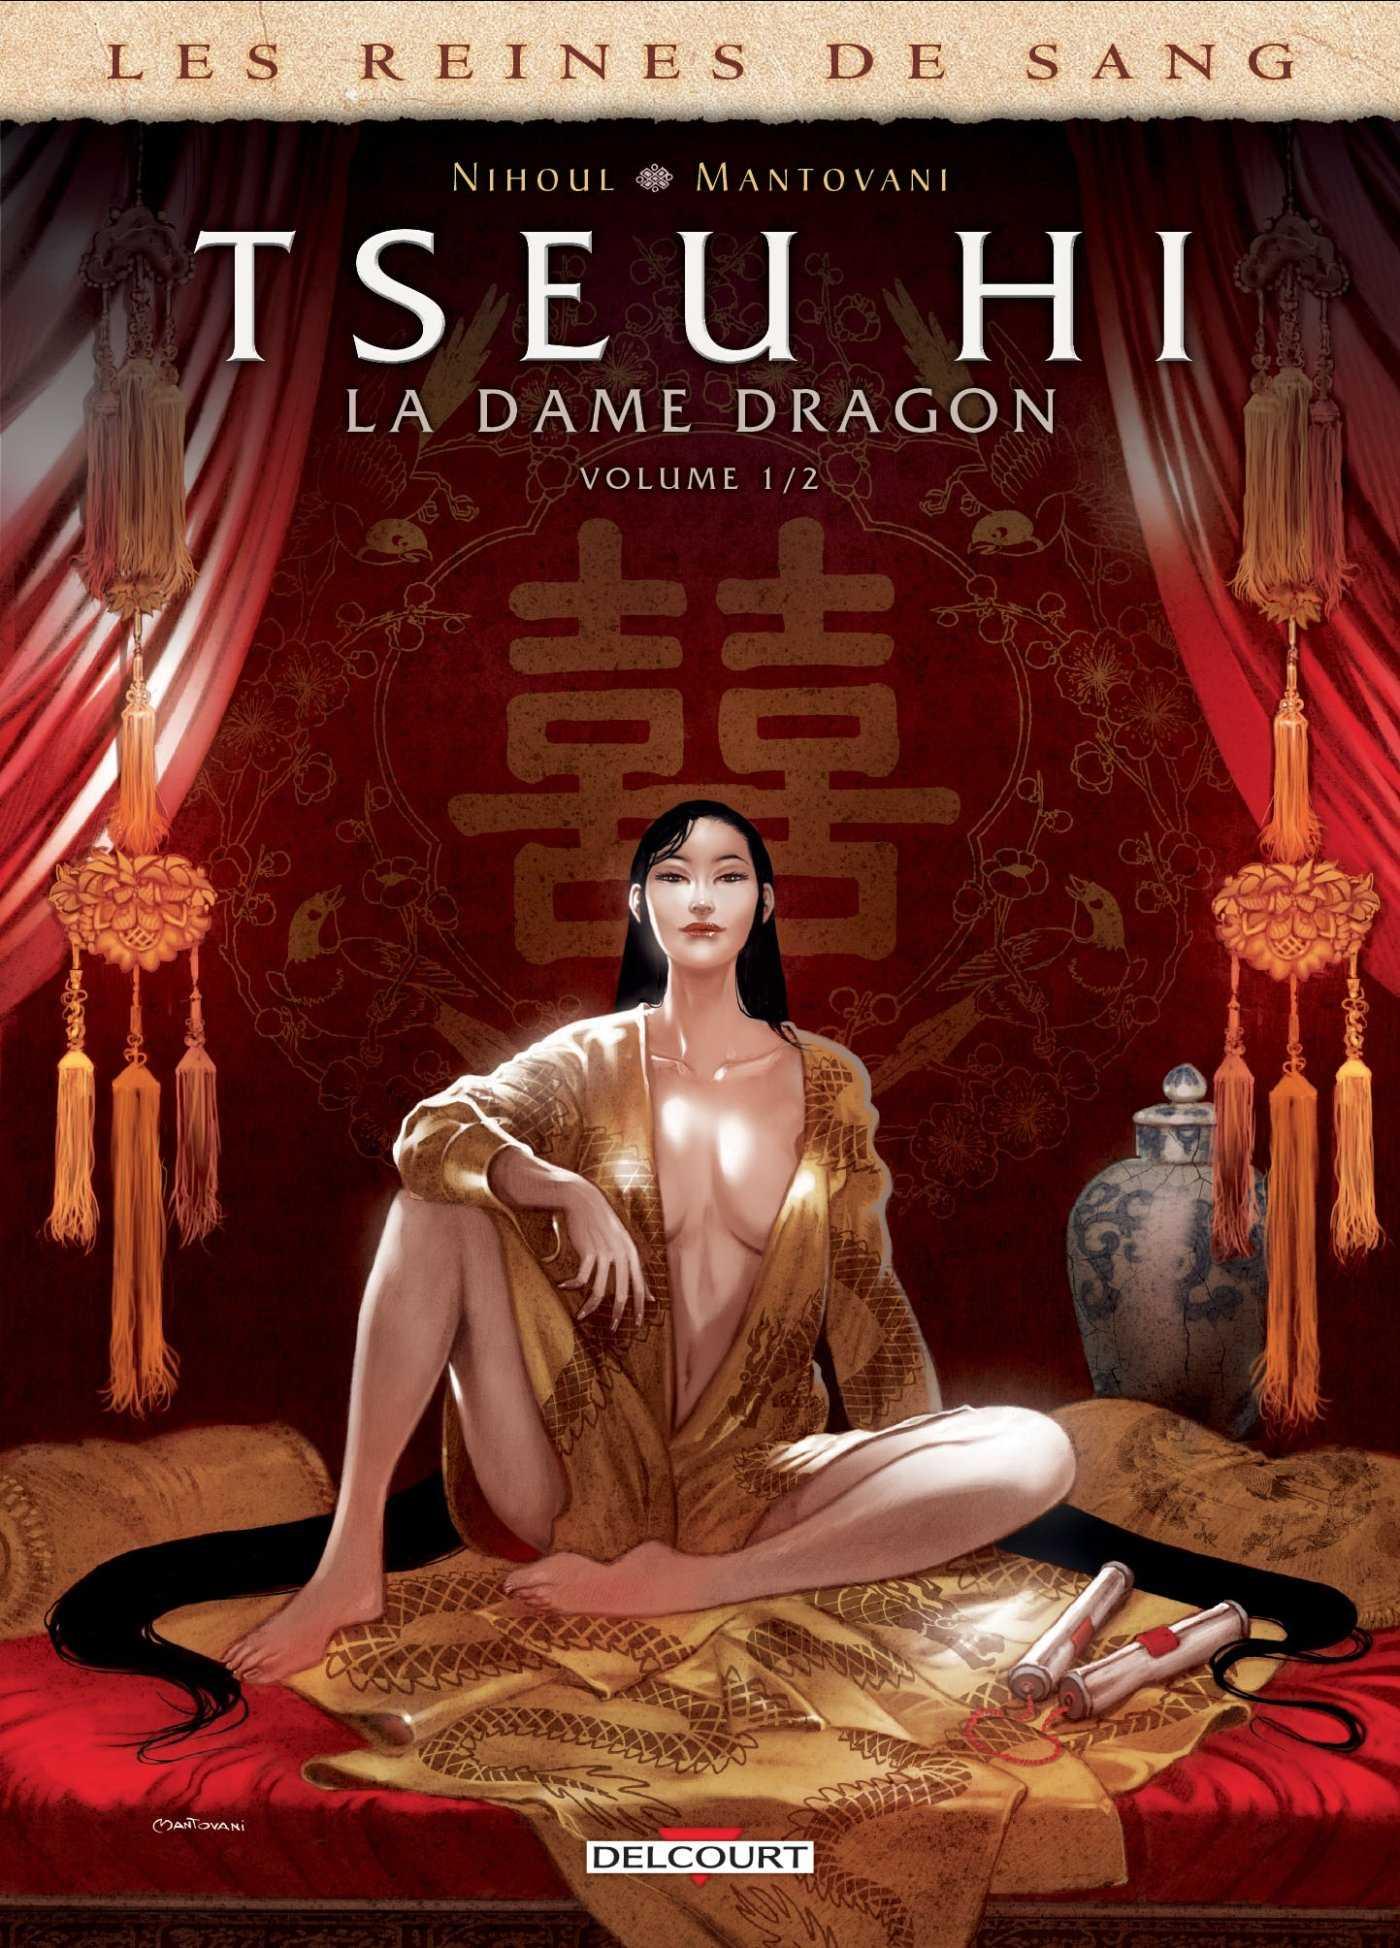 Tseu Hi, une reine sanglante chinoise